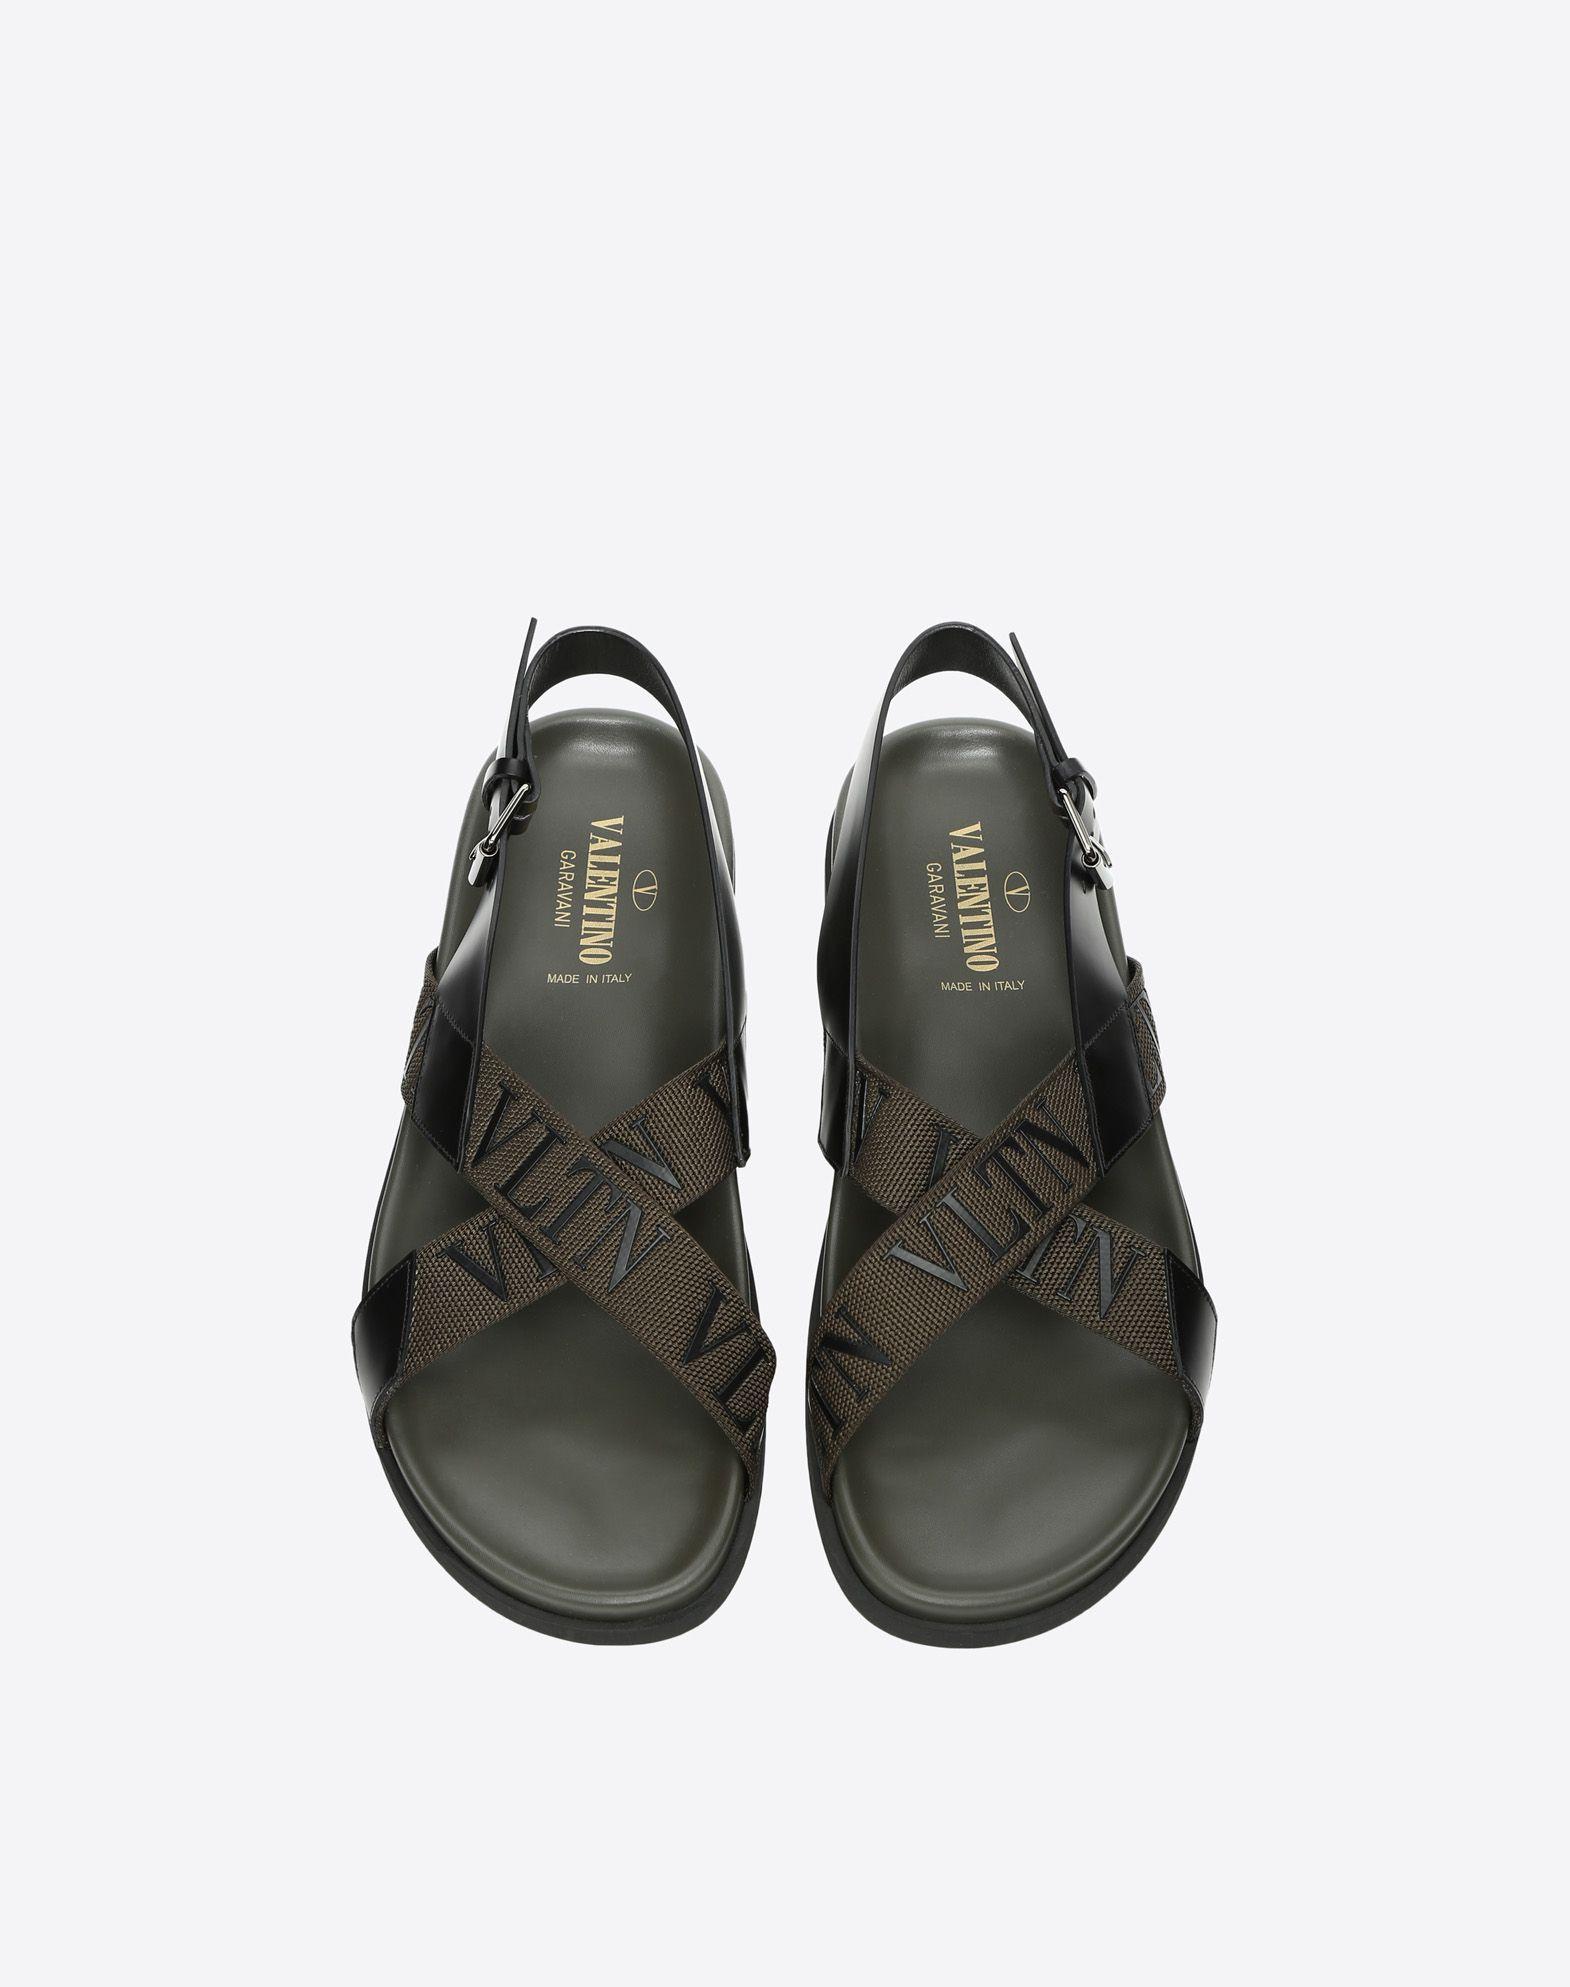 VALENTINO GARAVANI UOMO Low VLTN sandal  FLAT SANDALS U e